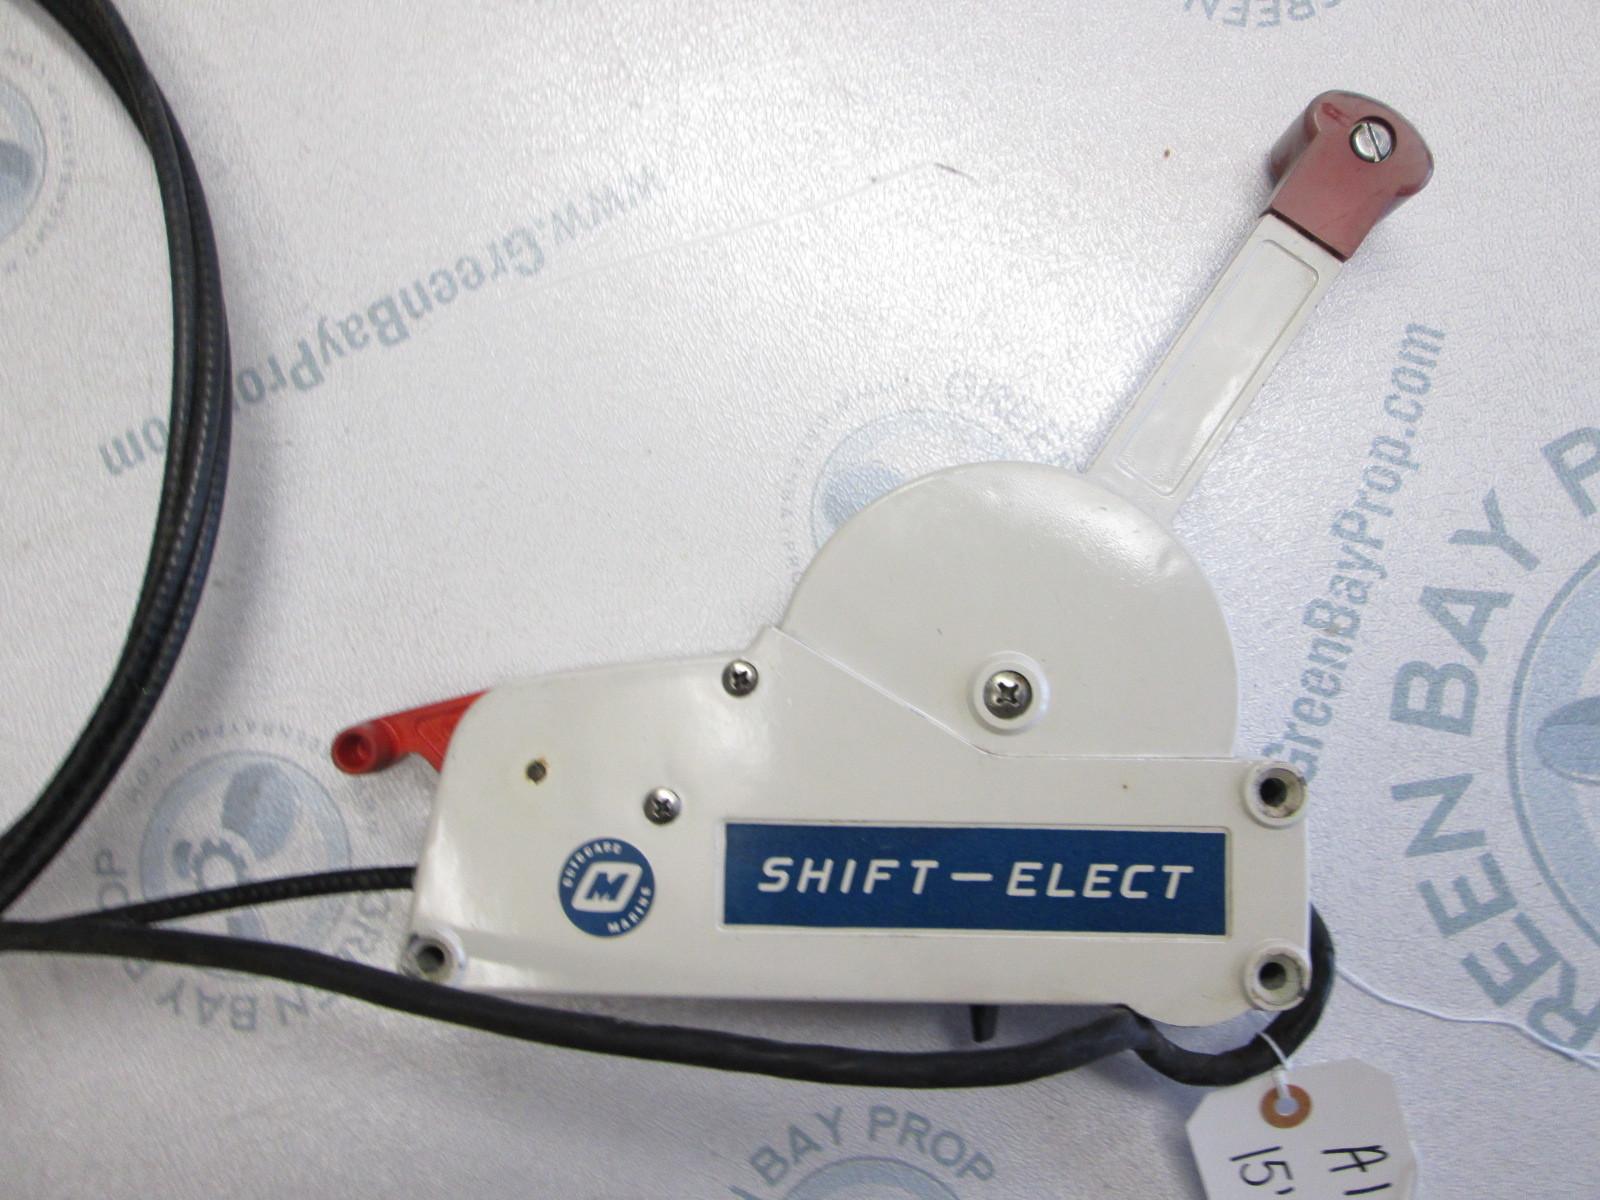 OMC Stringer Shift-Elect Throttle Remote Control Box & 14' Cable